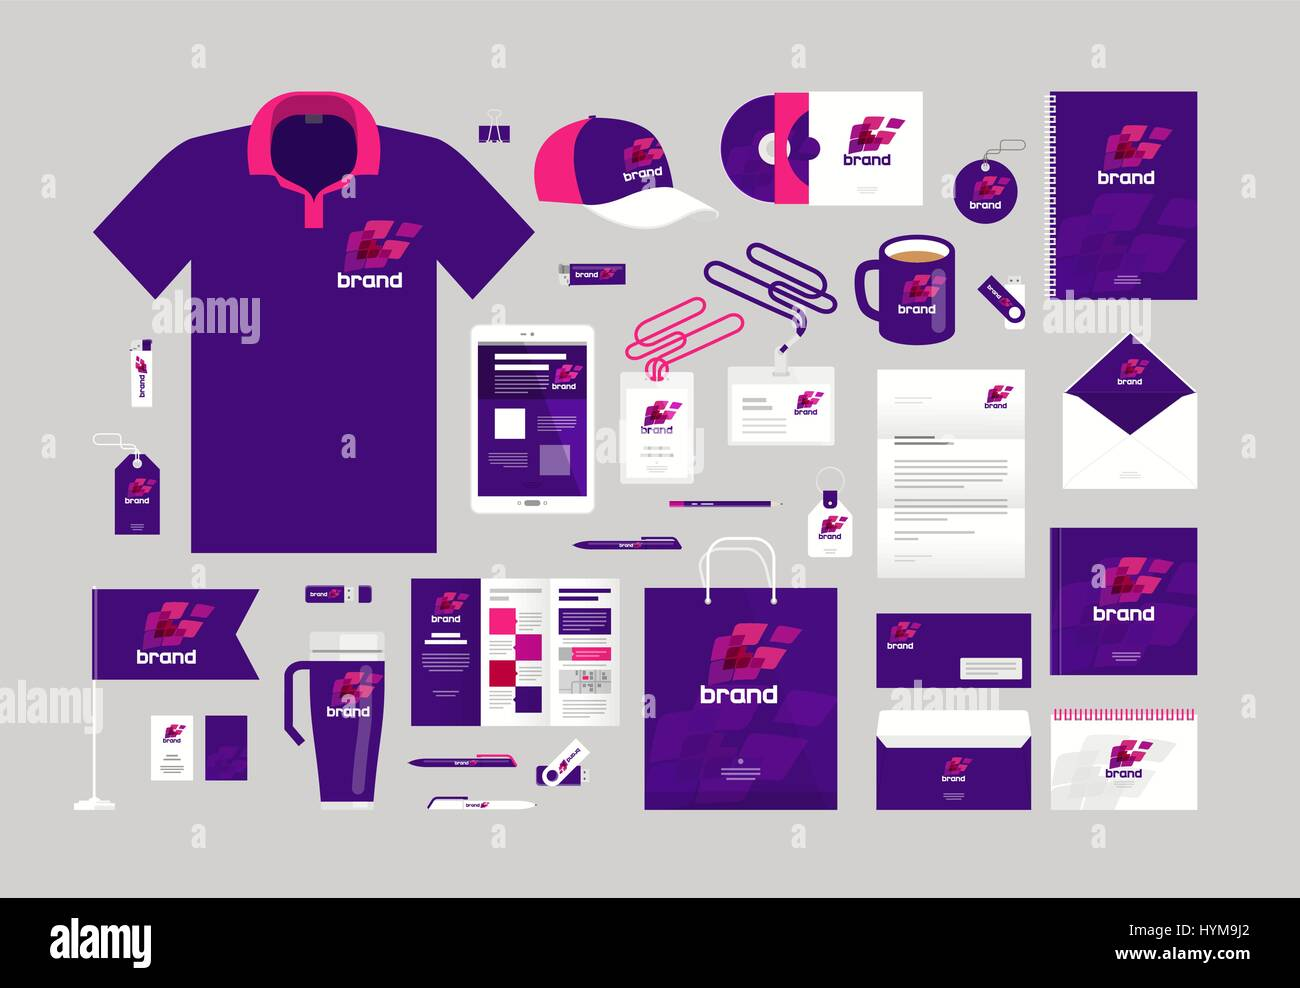 Business Design Corporate Identity Template Logo Label Brand